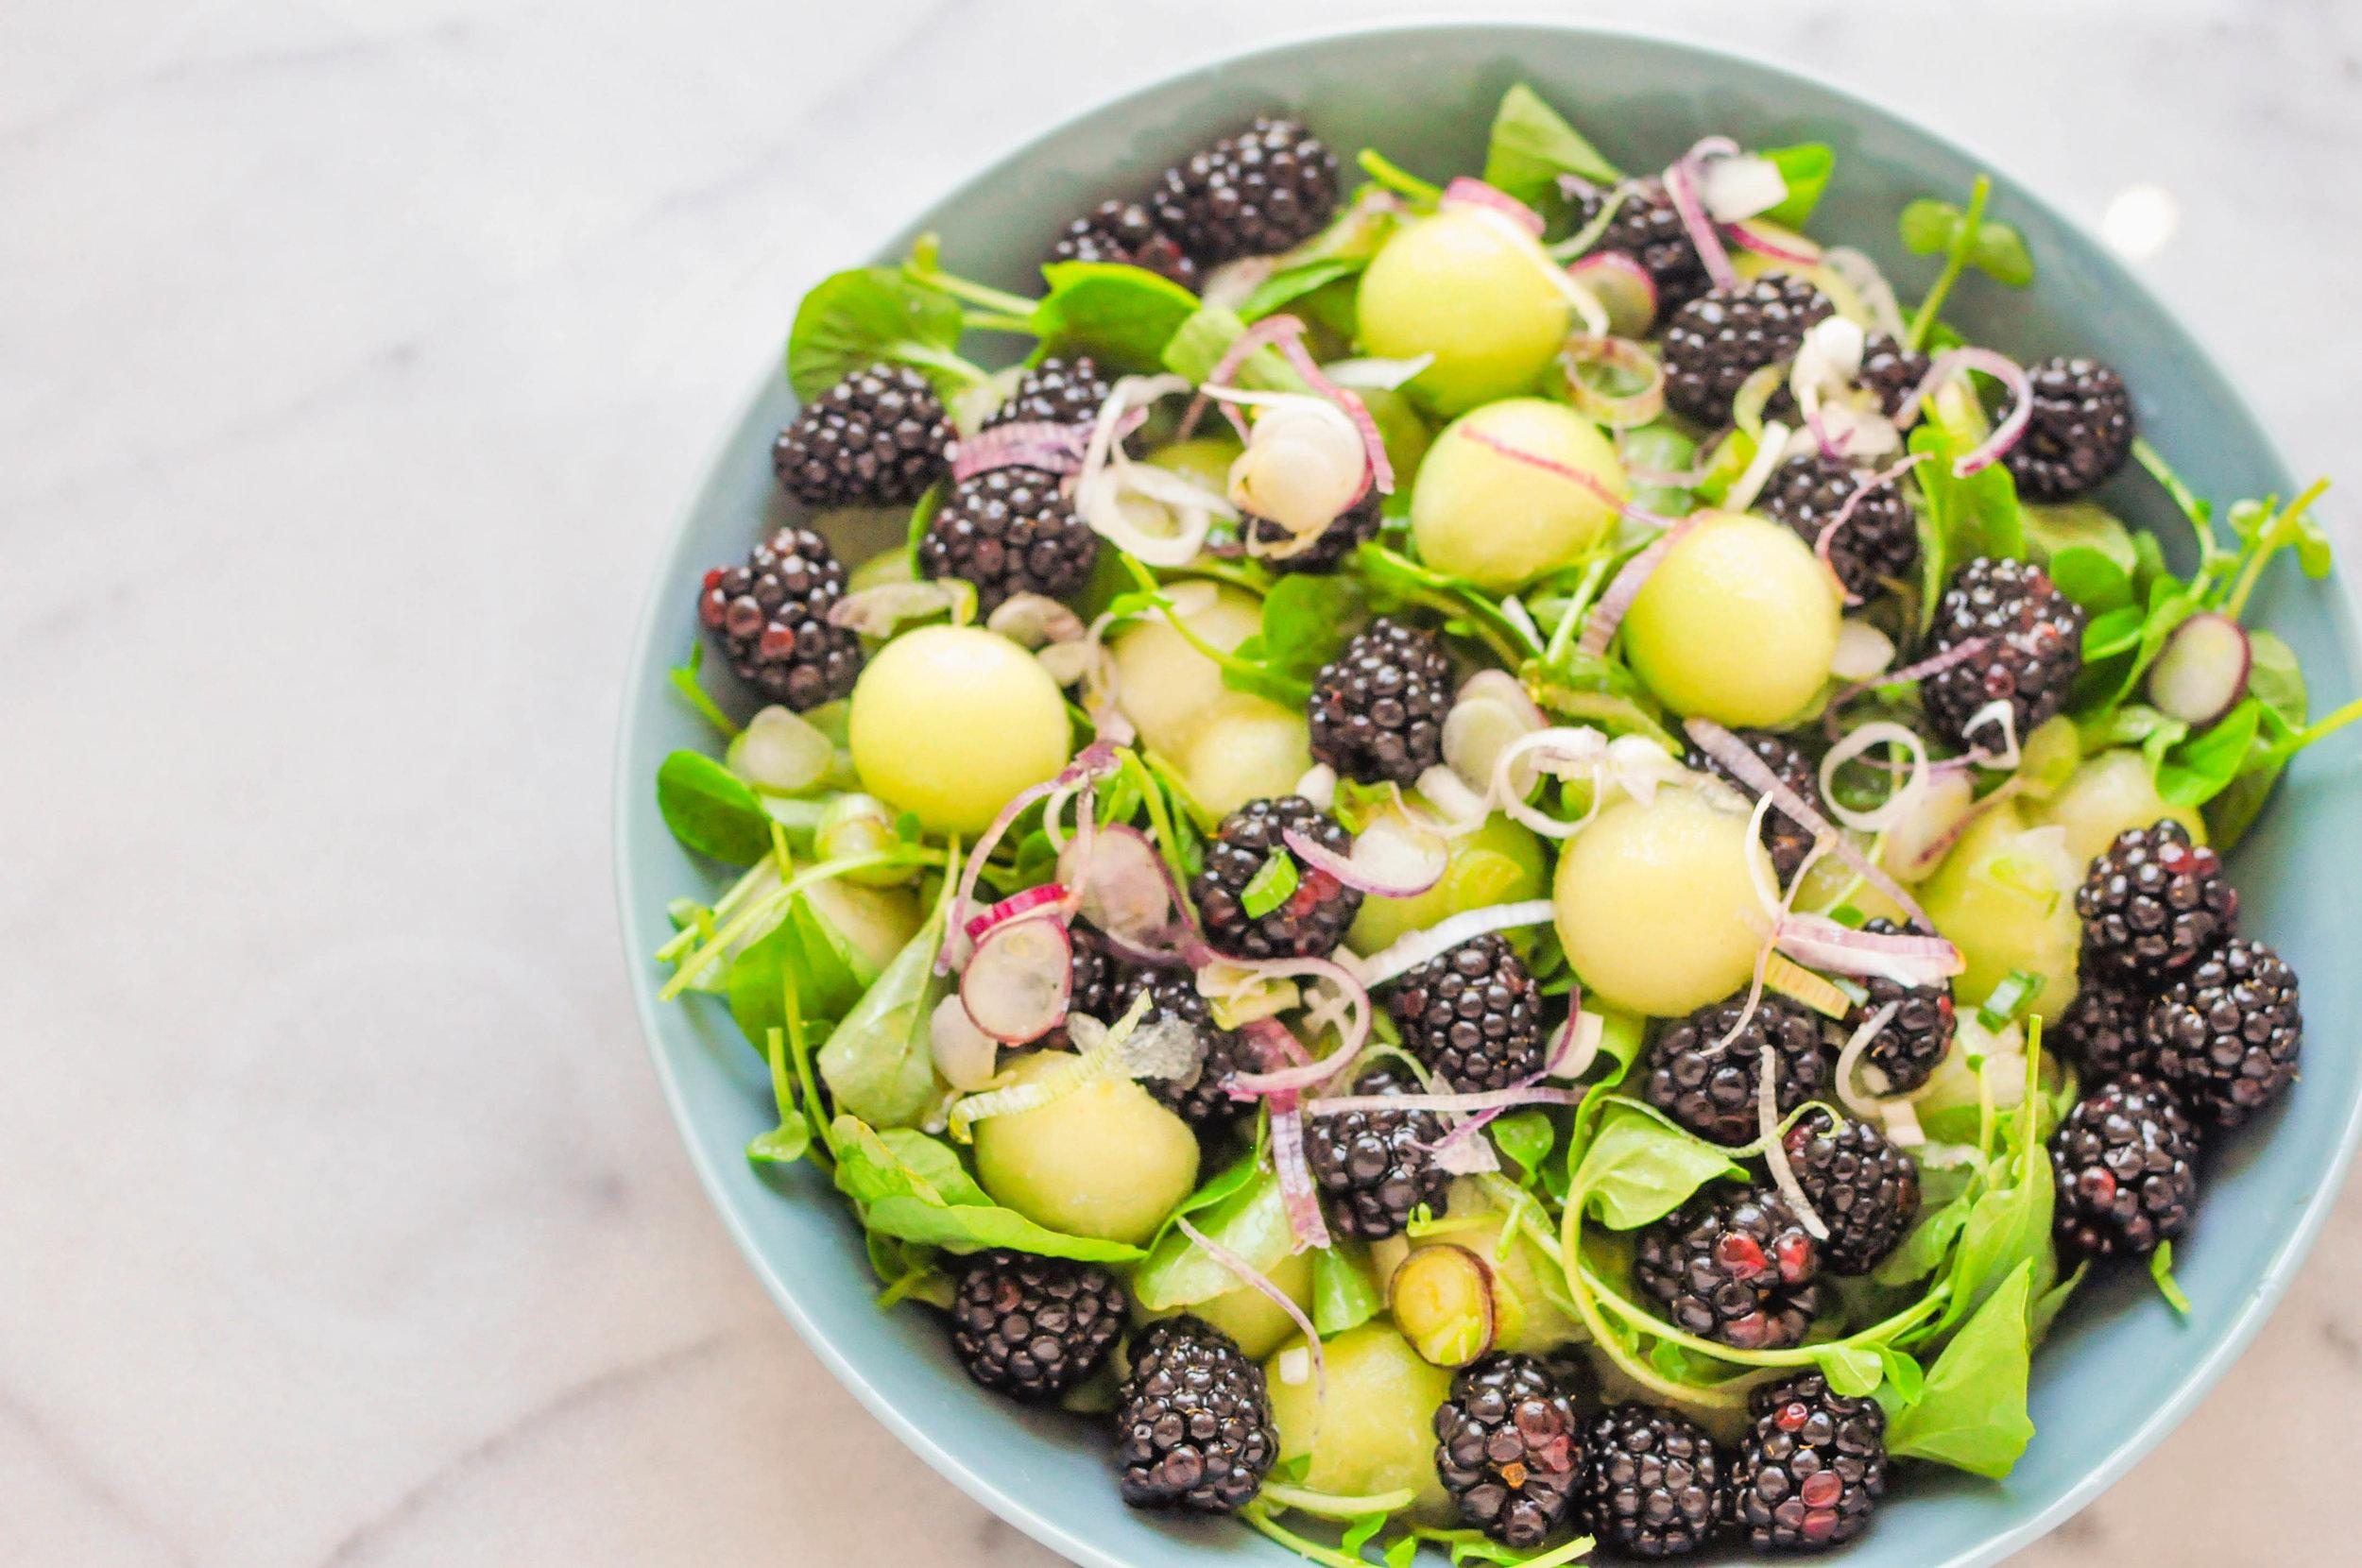 Vegan Honeydew Melon & Blackberry Salad (summer salad, vegetarian, gluten free, healthy) | This Healthy Table